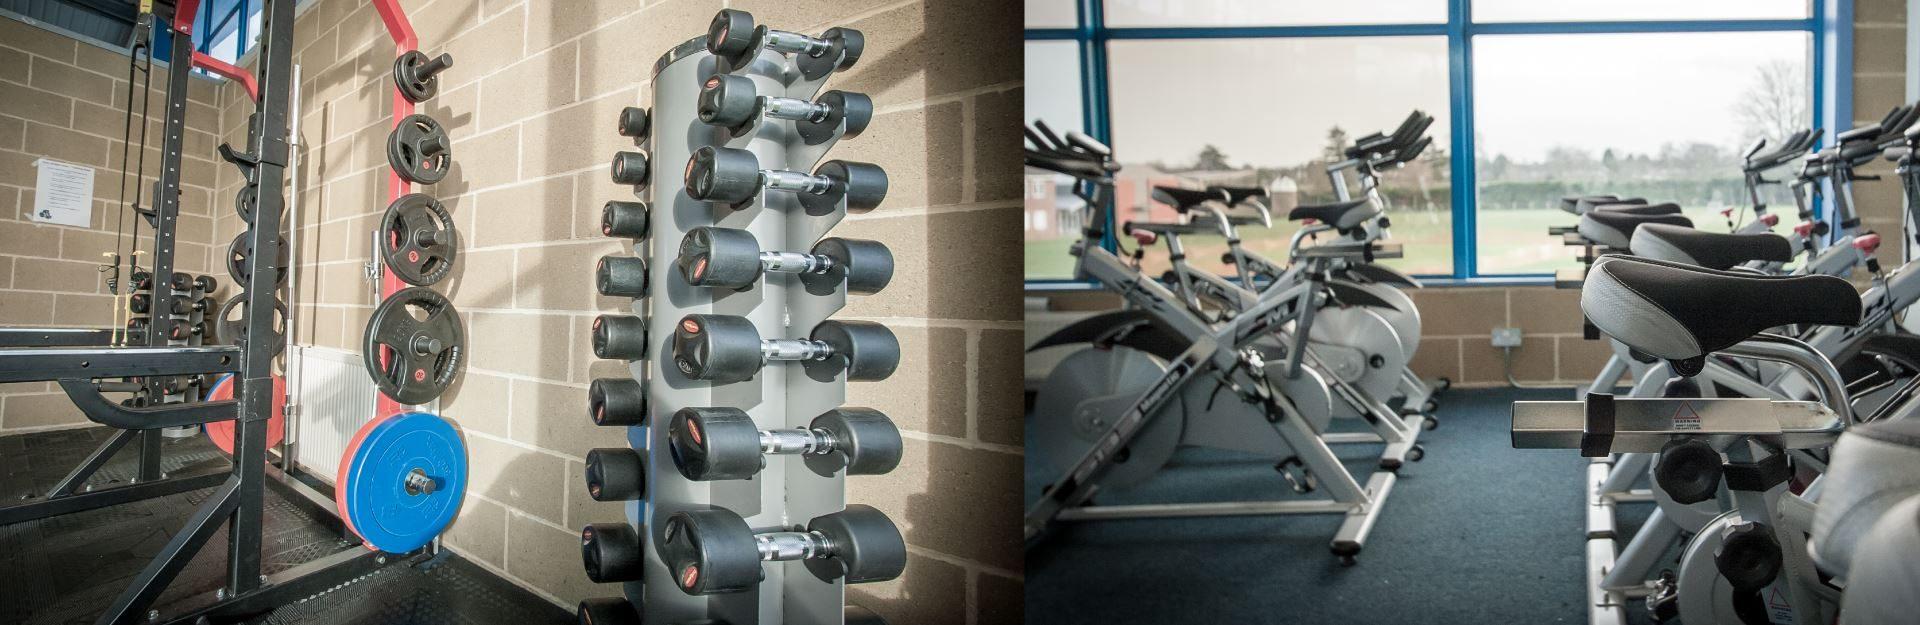 ProStart Fitness Studio